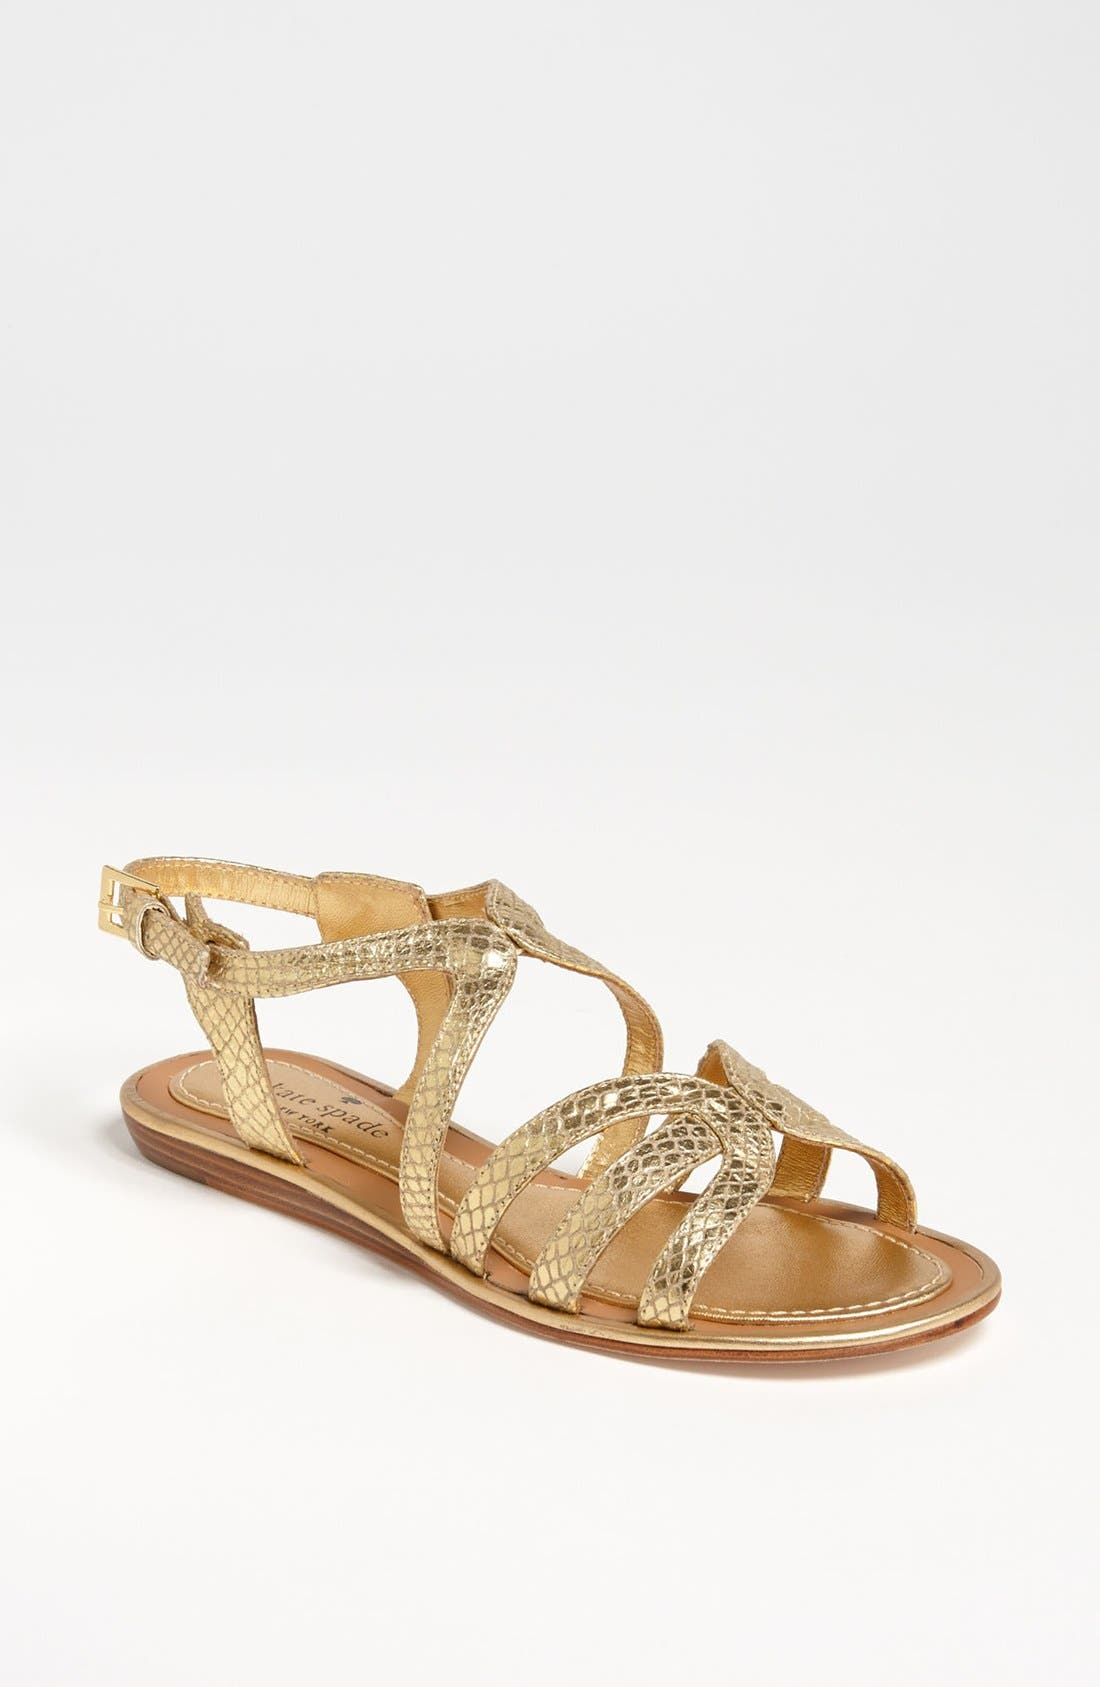 Main Image - kate spade new york 'intro' sandal